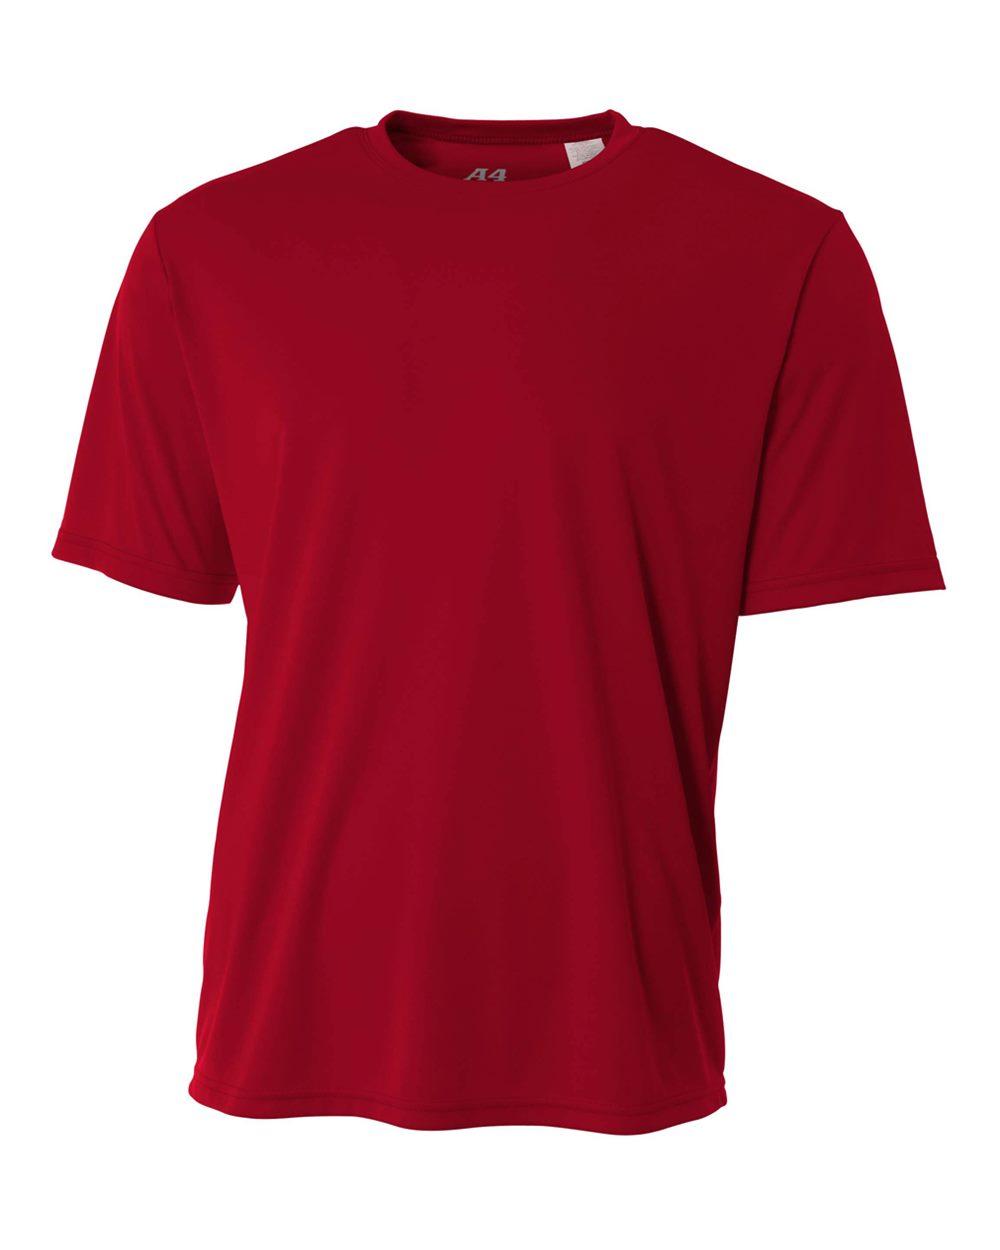 mw-polo-cardinal-red.jpg